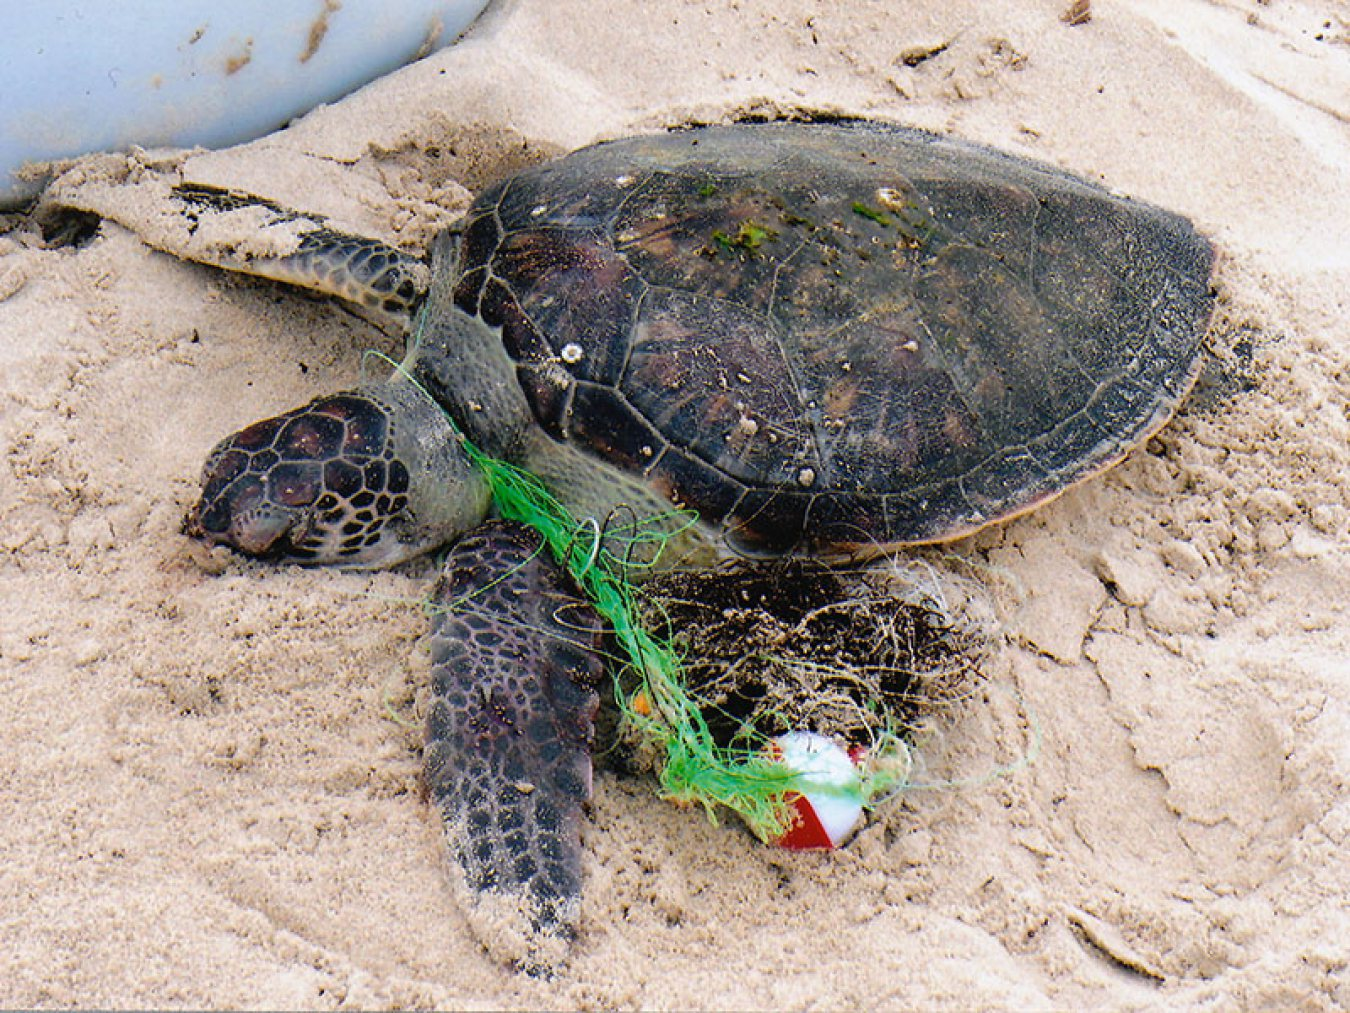 Green Sea Turtle Entangled in Fishing Line